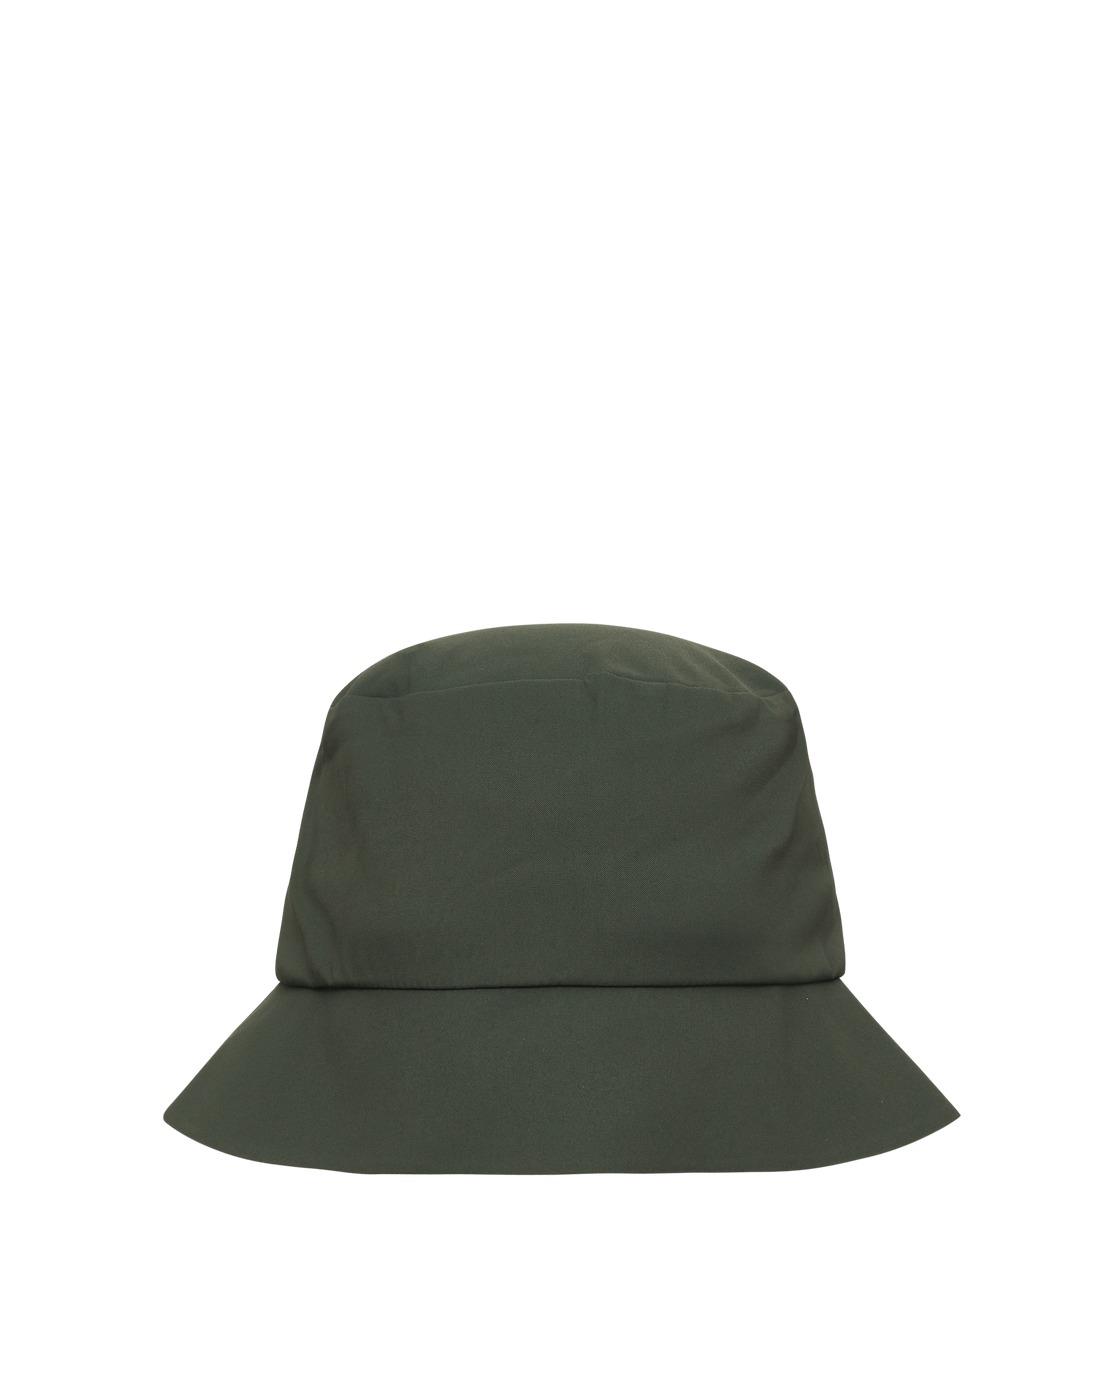 Photo: Affix Stow Bucket Hat Field Green